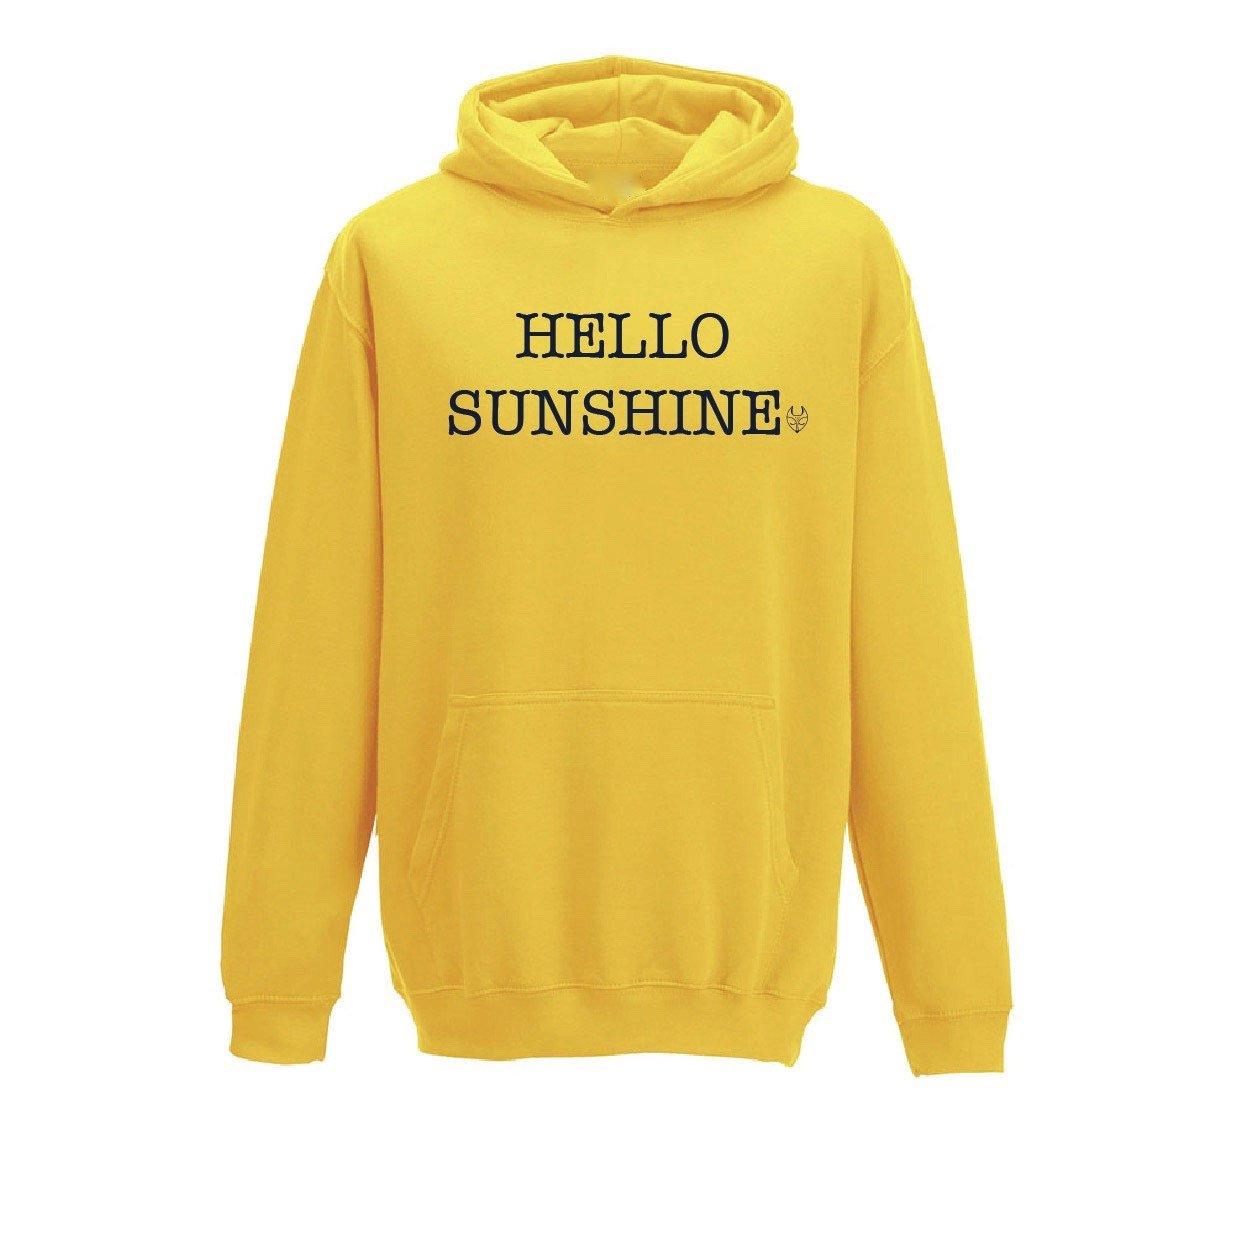 Bax and Bay hello sunshine hoodie, £50